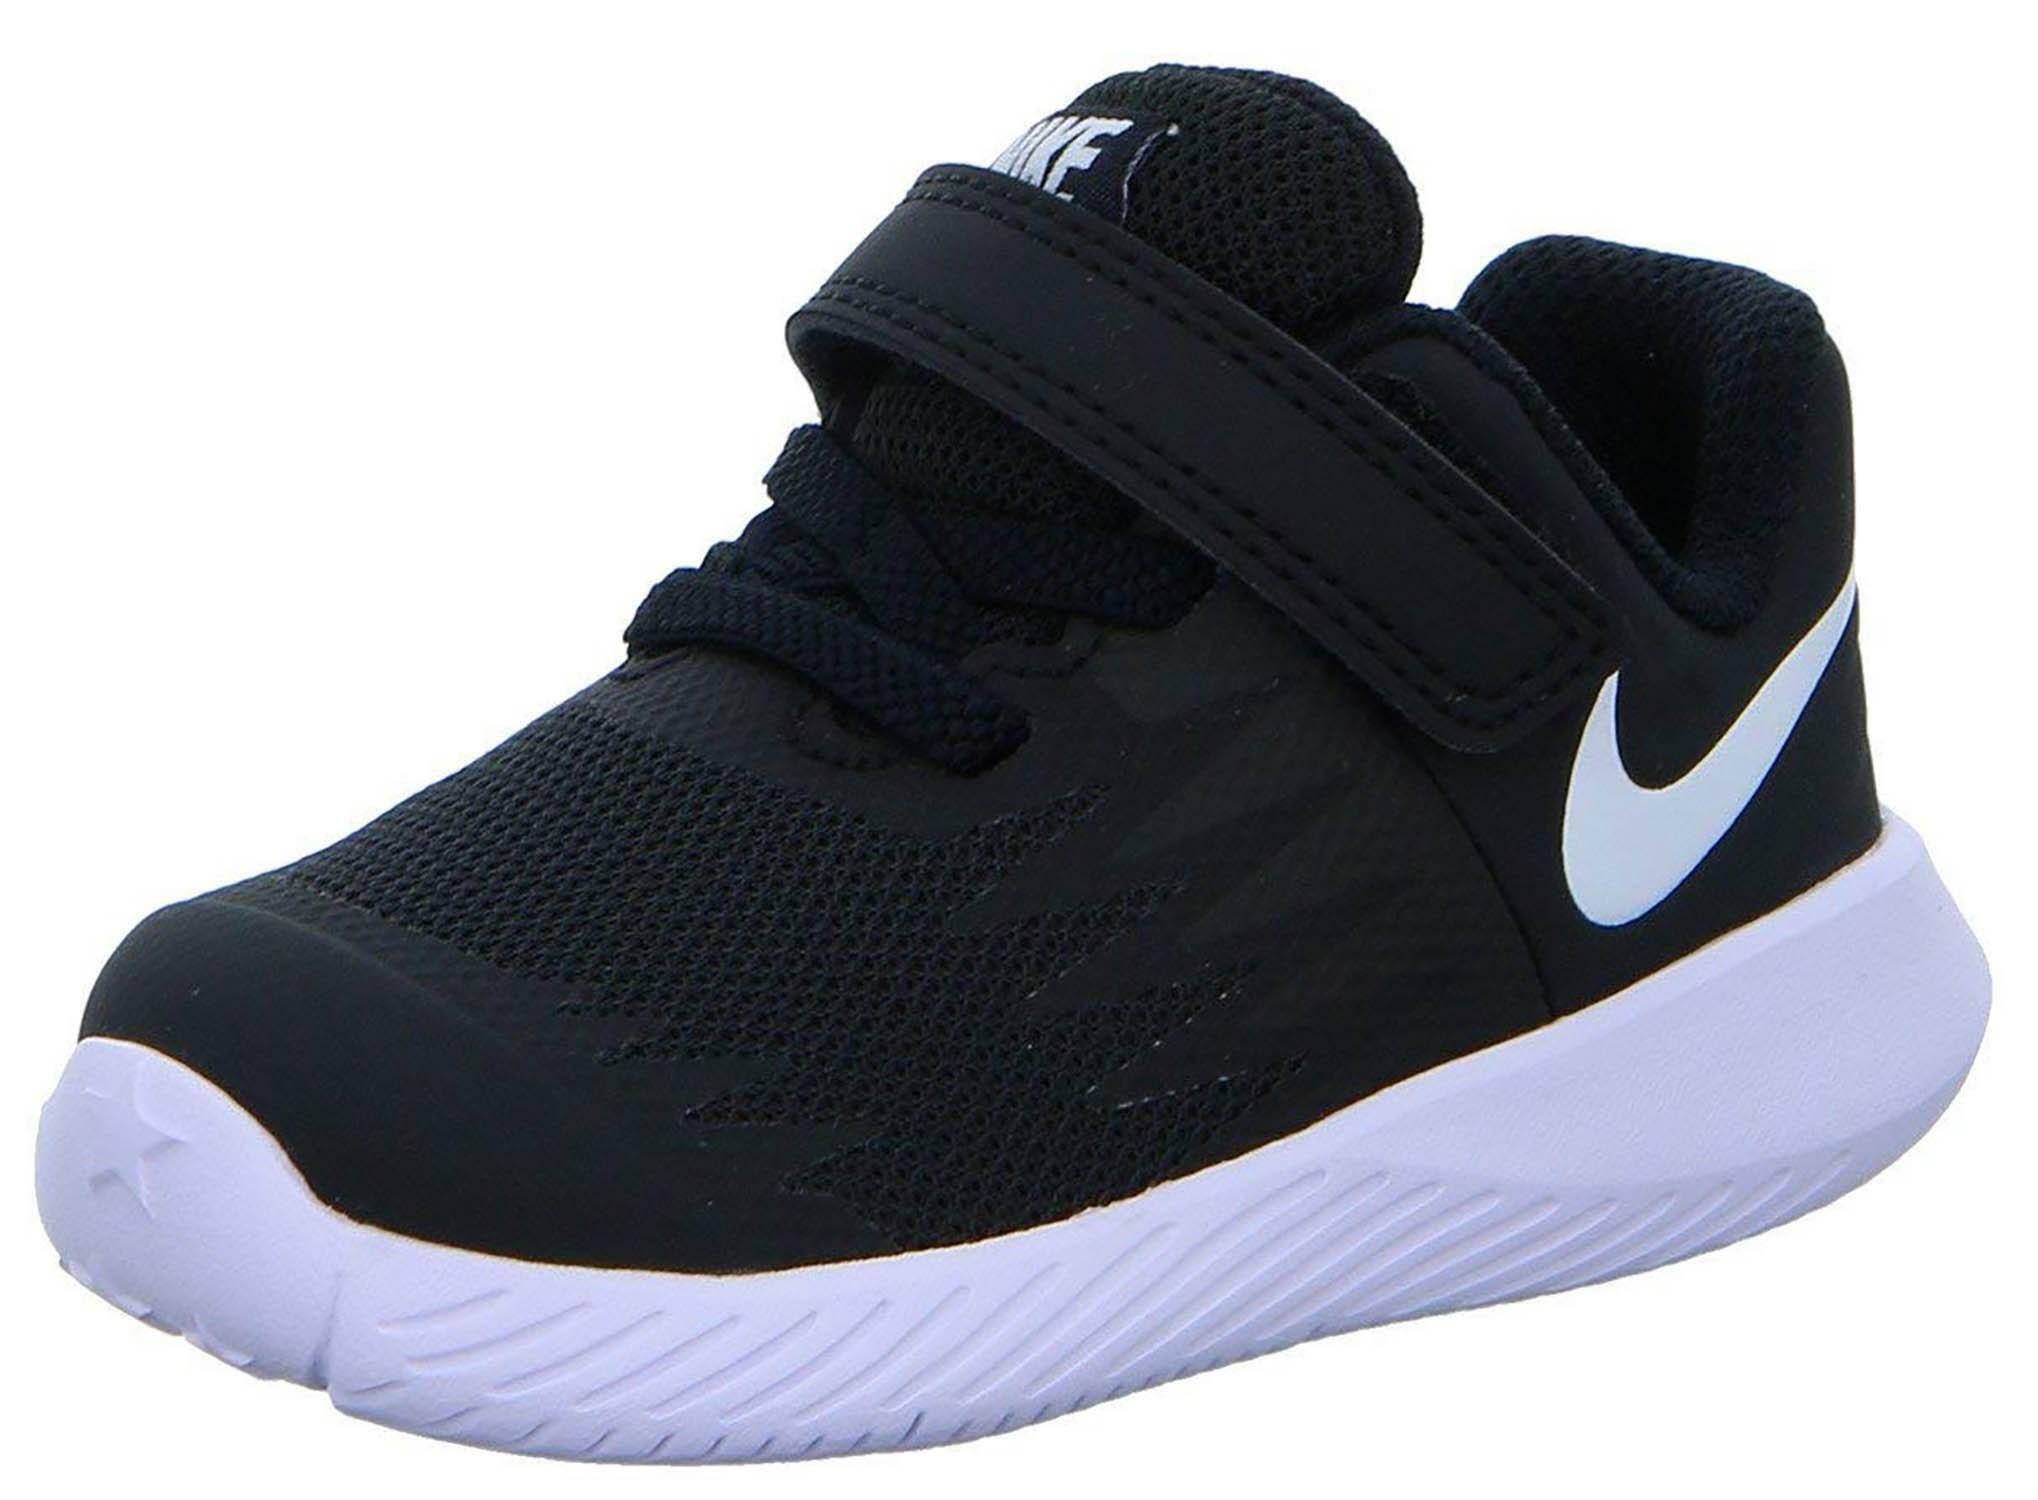 nike nike star runner tdv scarpe sportive bambino nere 907255001